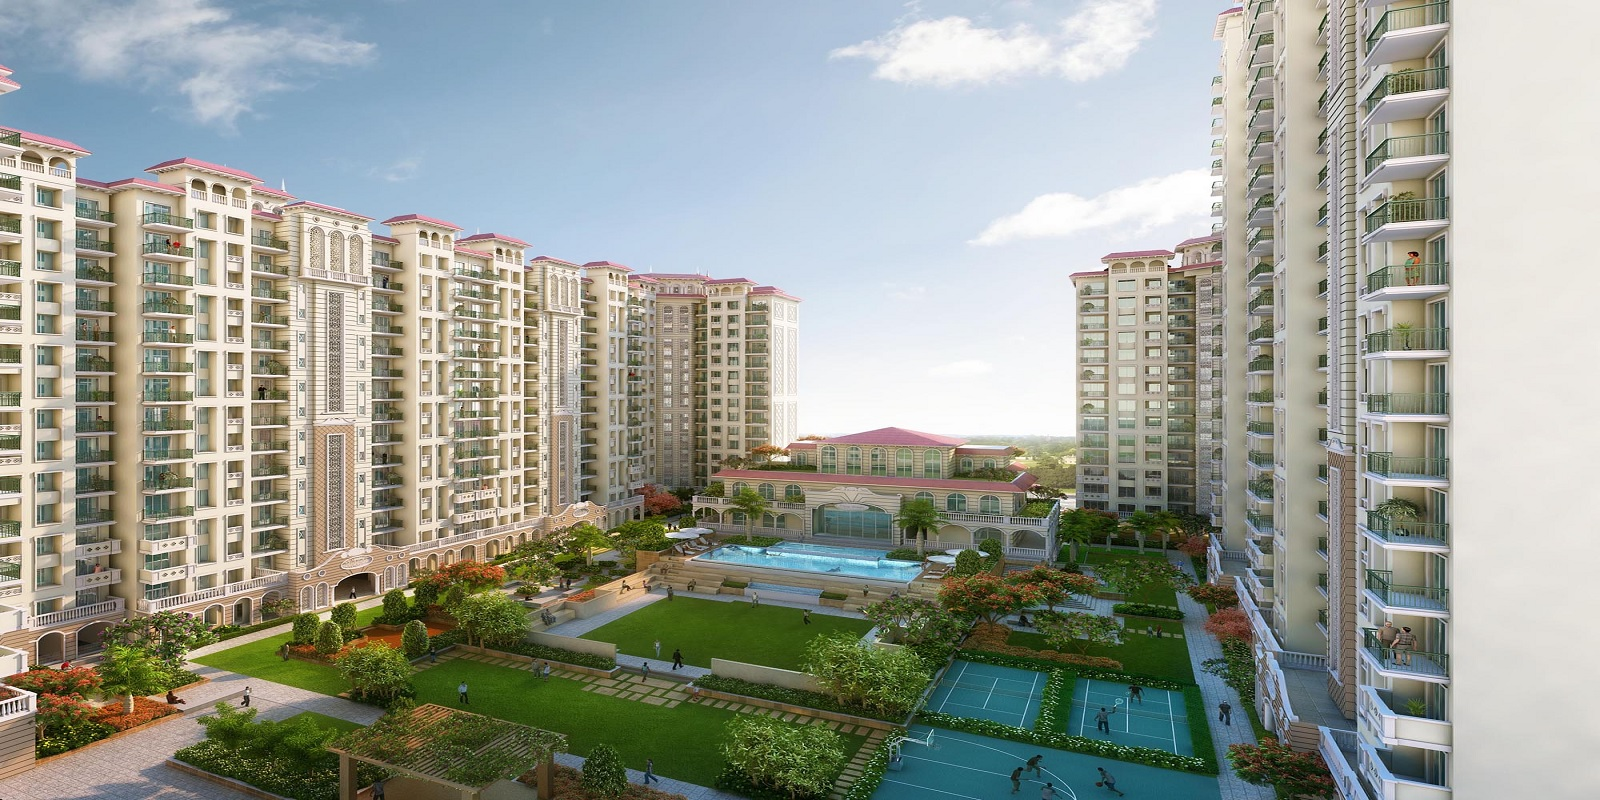 radhey krishna casa green i amenities features8